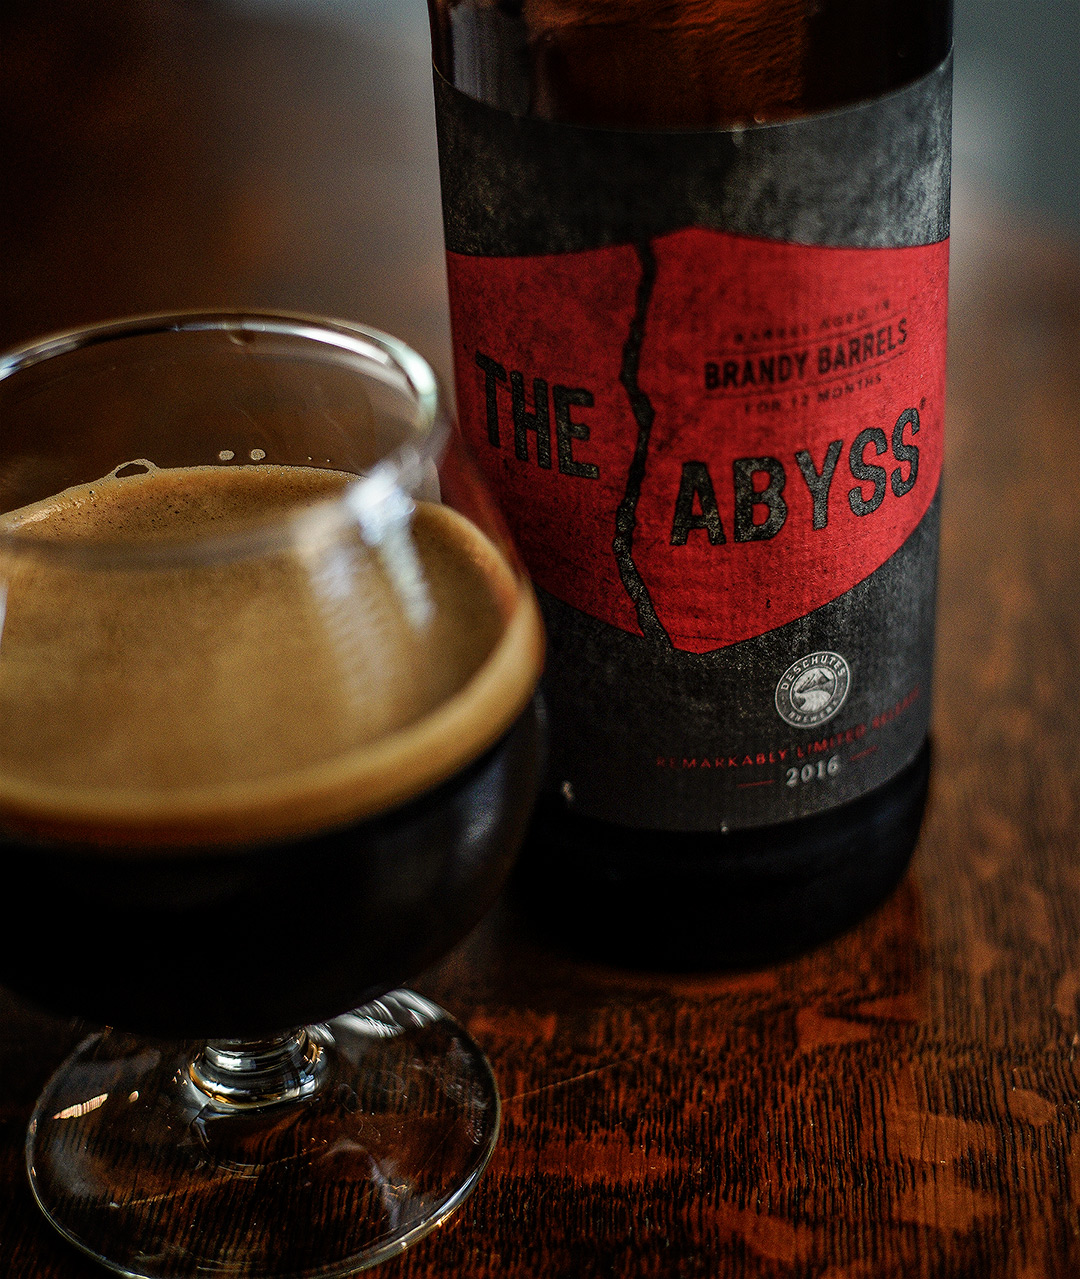 Deschutes Brandy Barrel Abyss Rocks Your Mouth Off